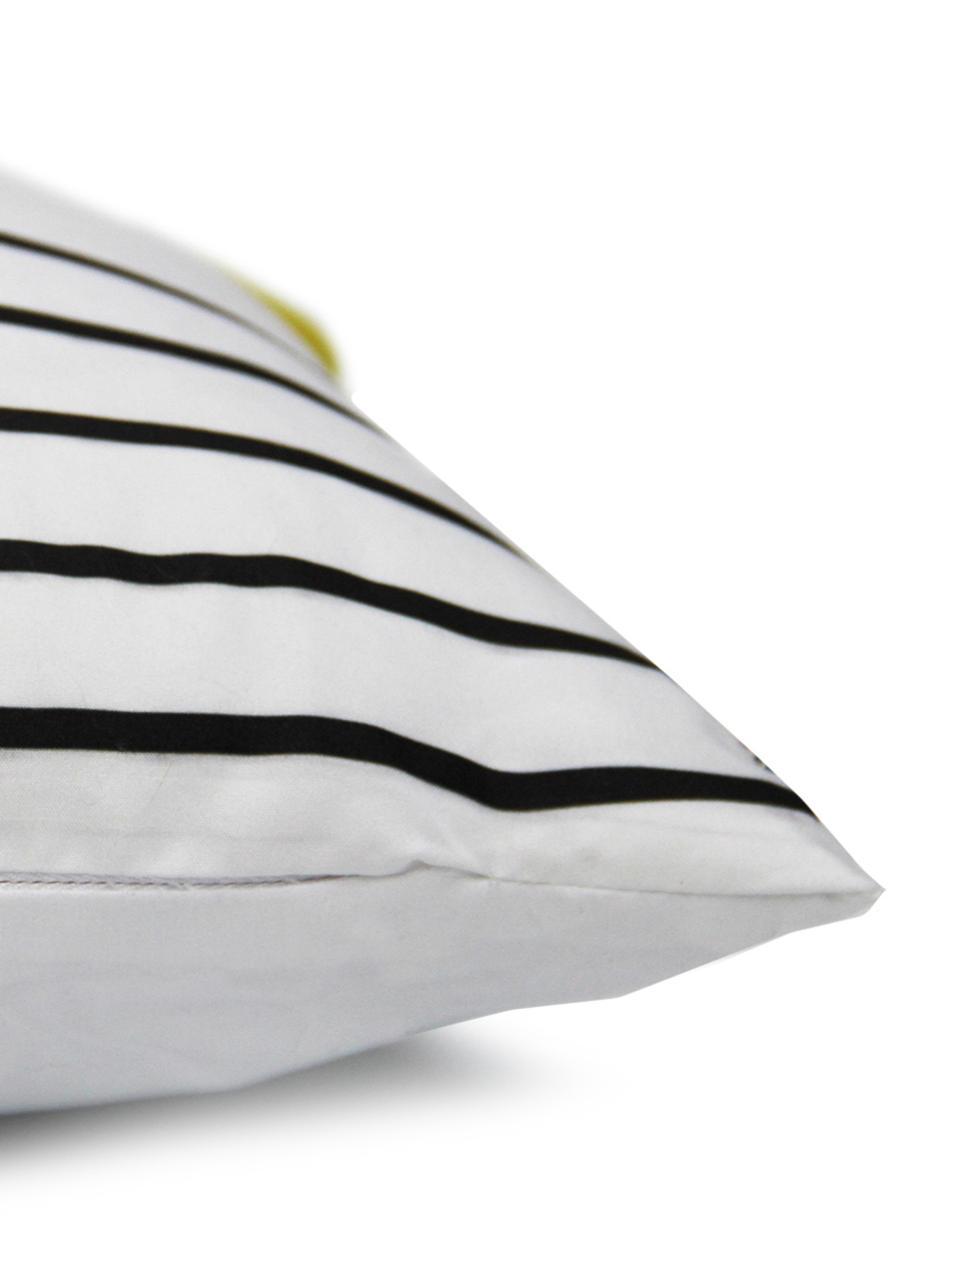 Federa arredo a righe Magdalena, Poliestere, Bianco, giallo, nero, Larg. 30 x Lung. 50 cm